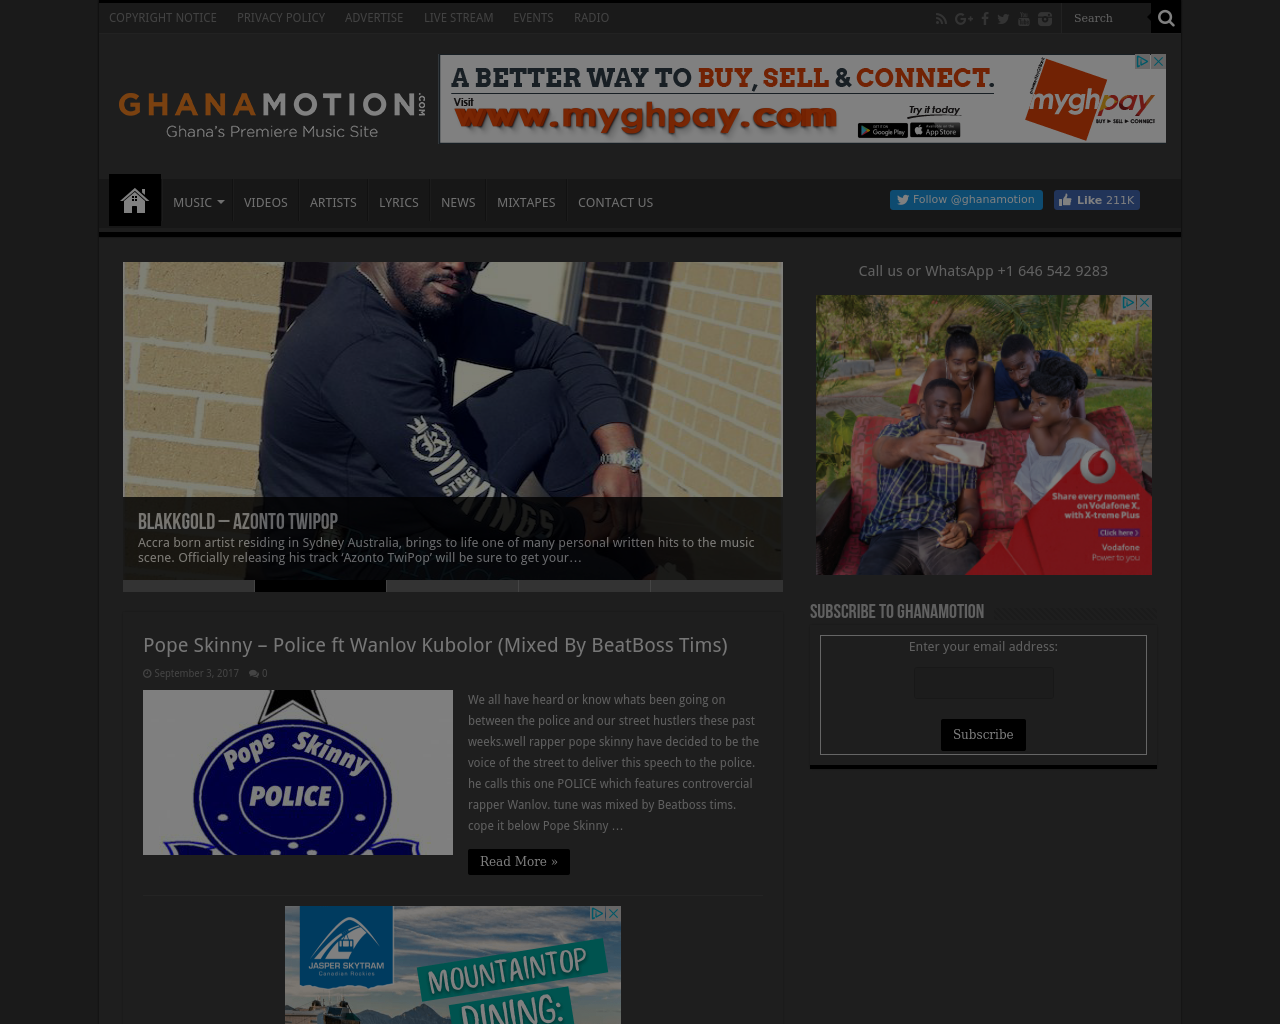 ghanamotion.com-Advertising-Reviews-Pricing